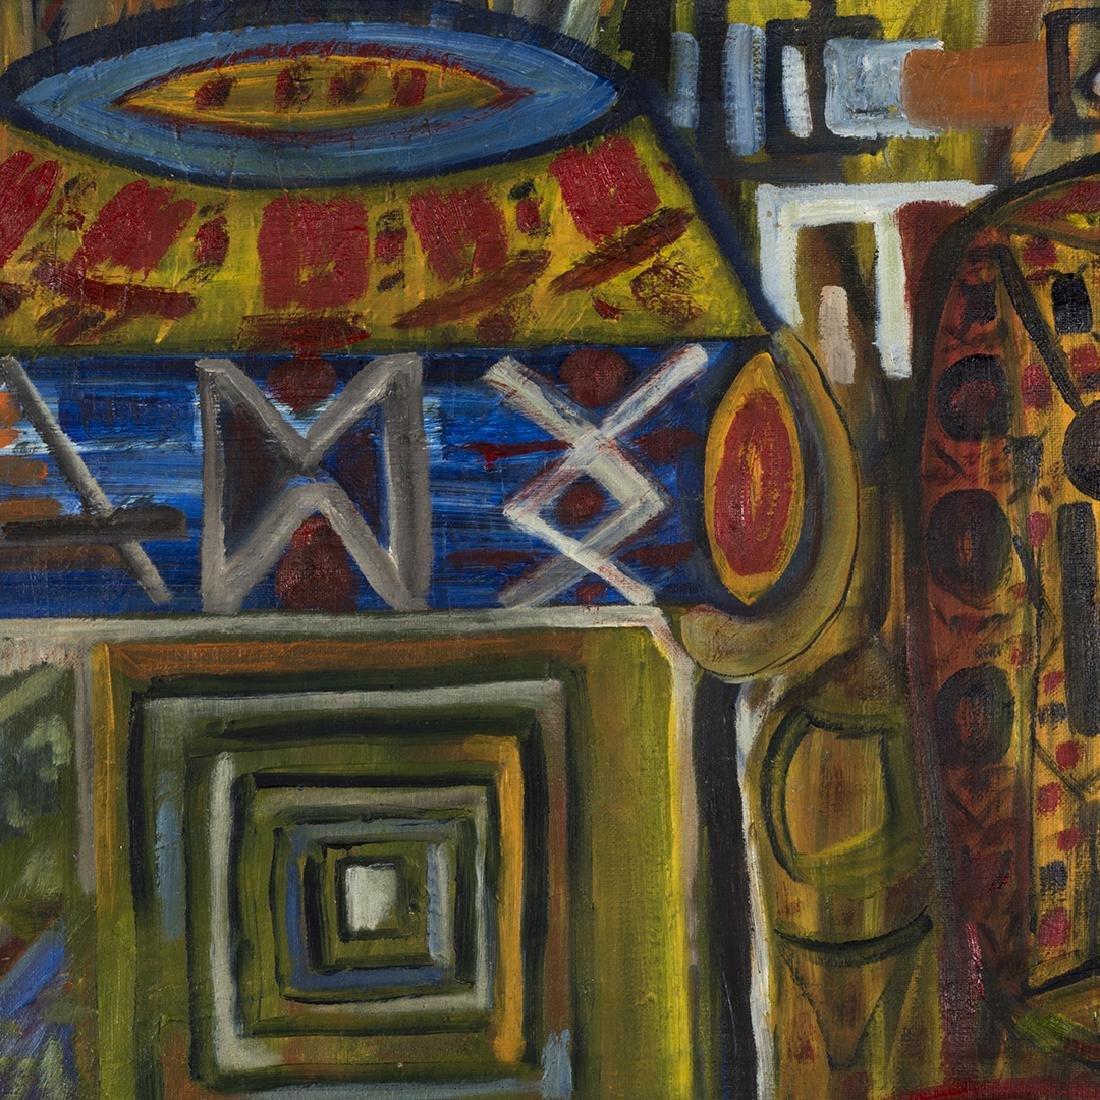 R. Delaunay Abstract - 3